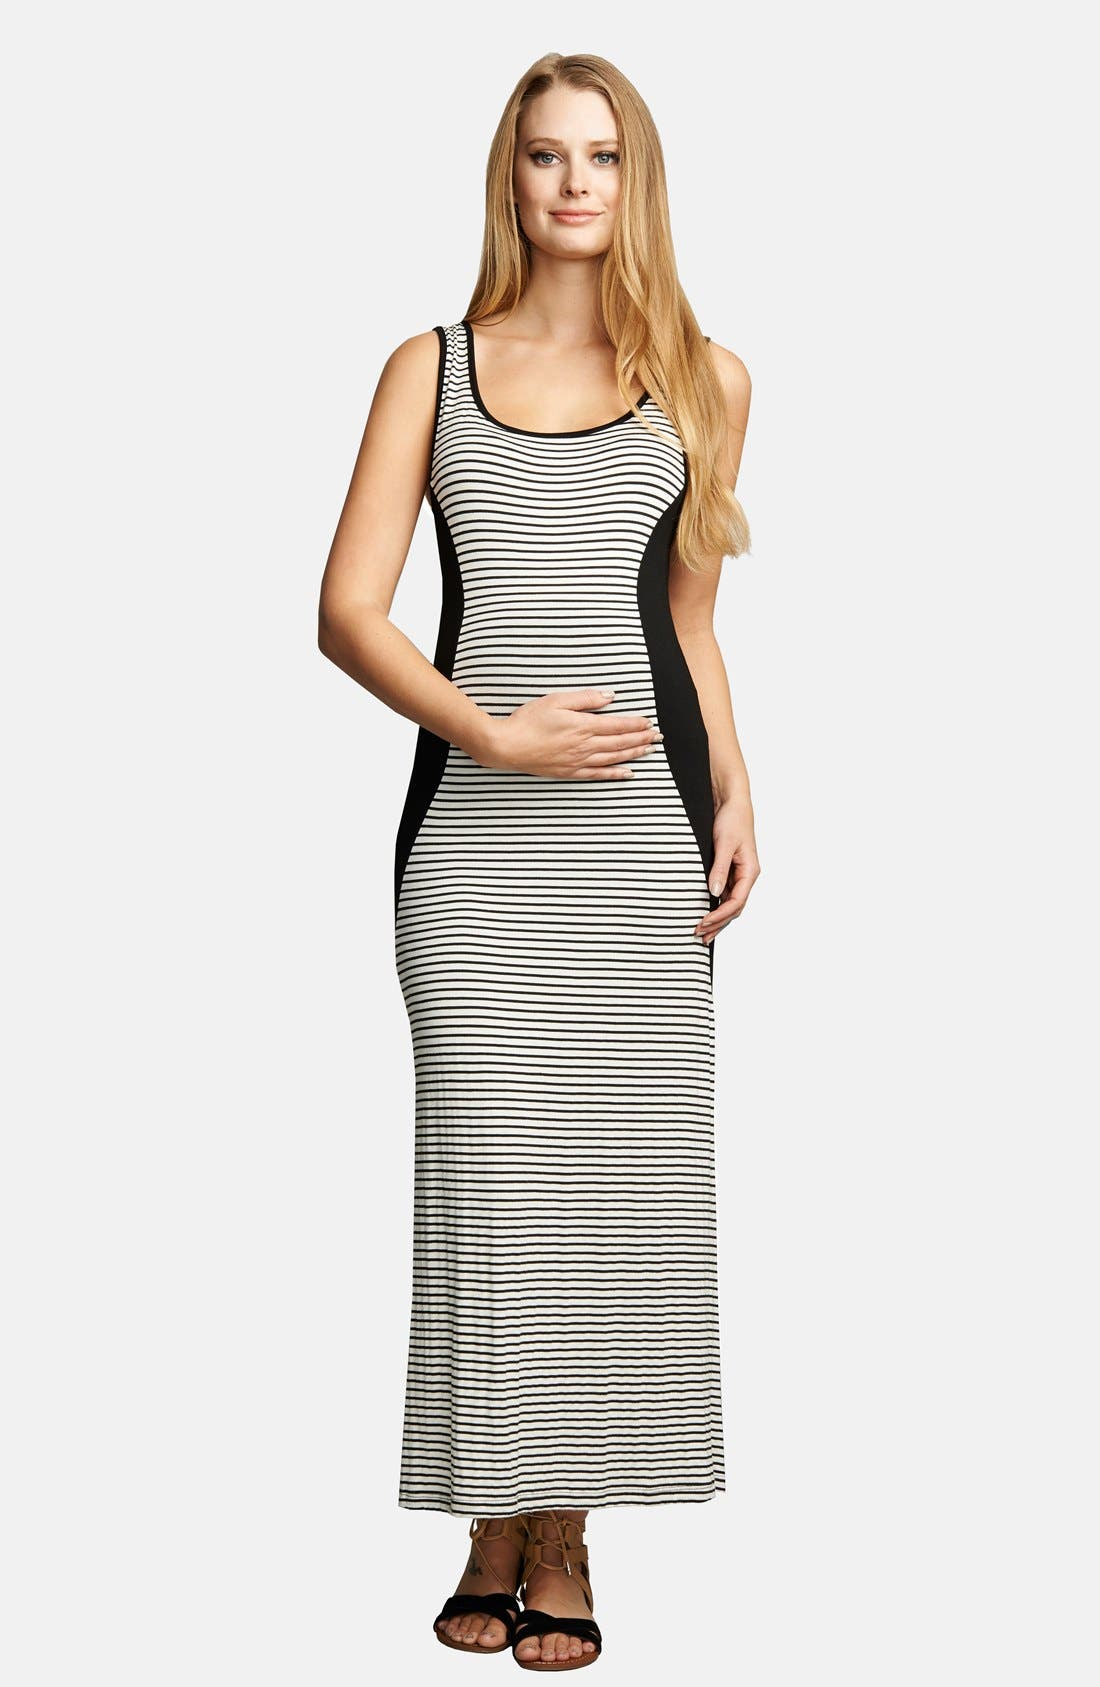 Scoop Neck Maxi Lightweight Maternity Dress,                             Main thumbnail 1, color,                             001